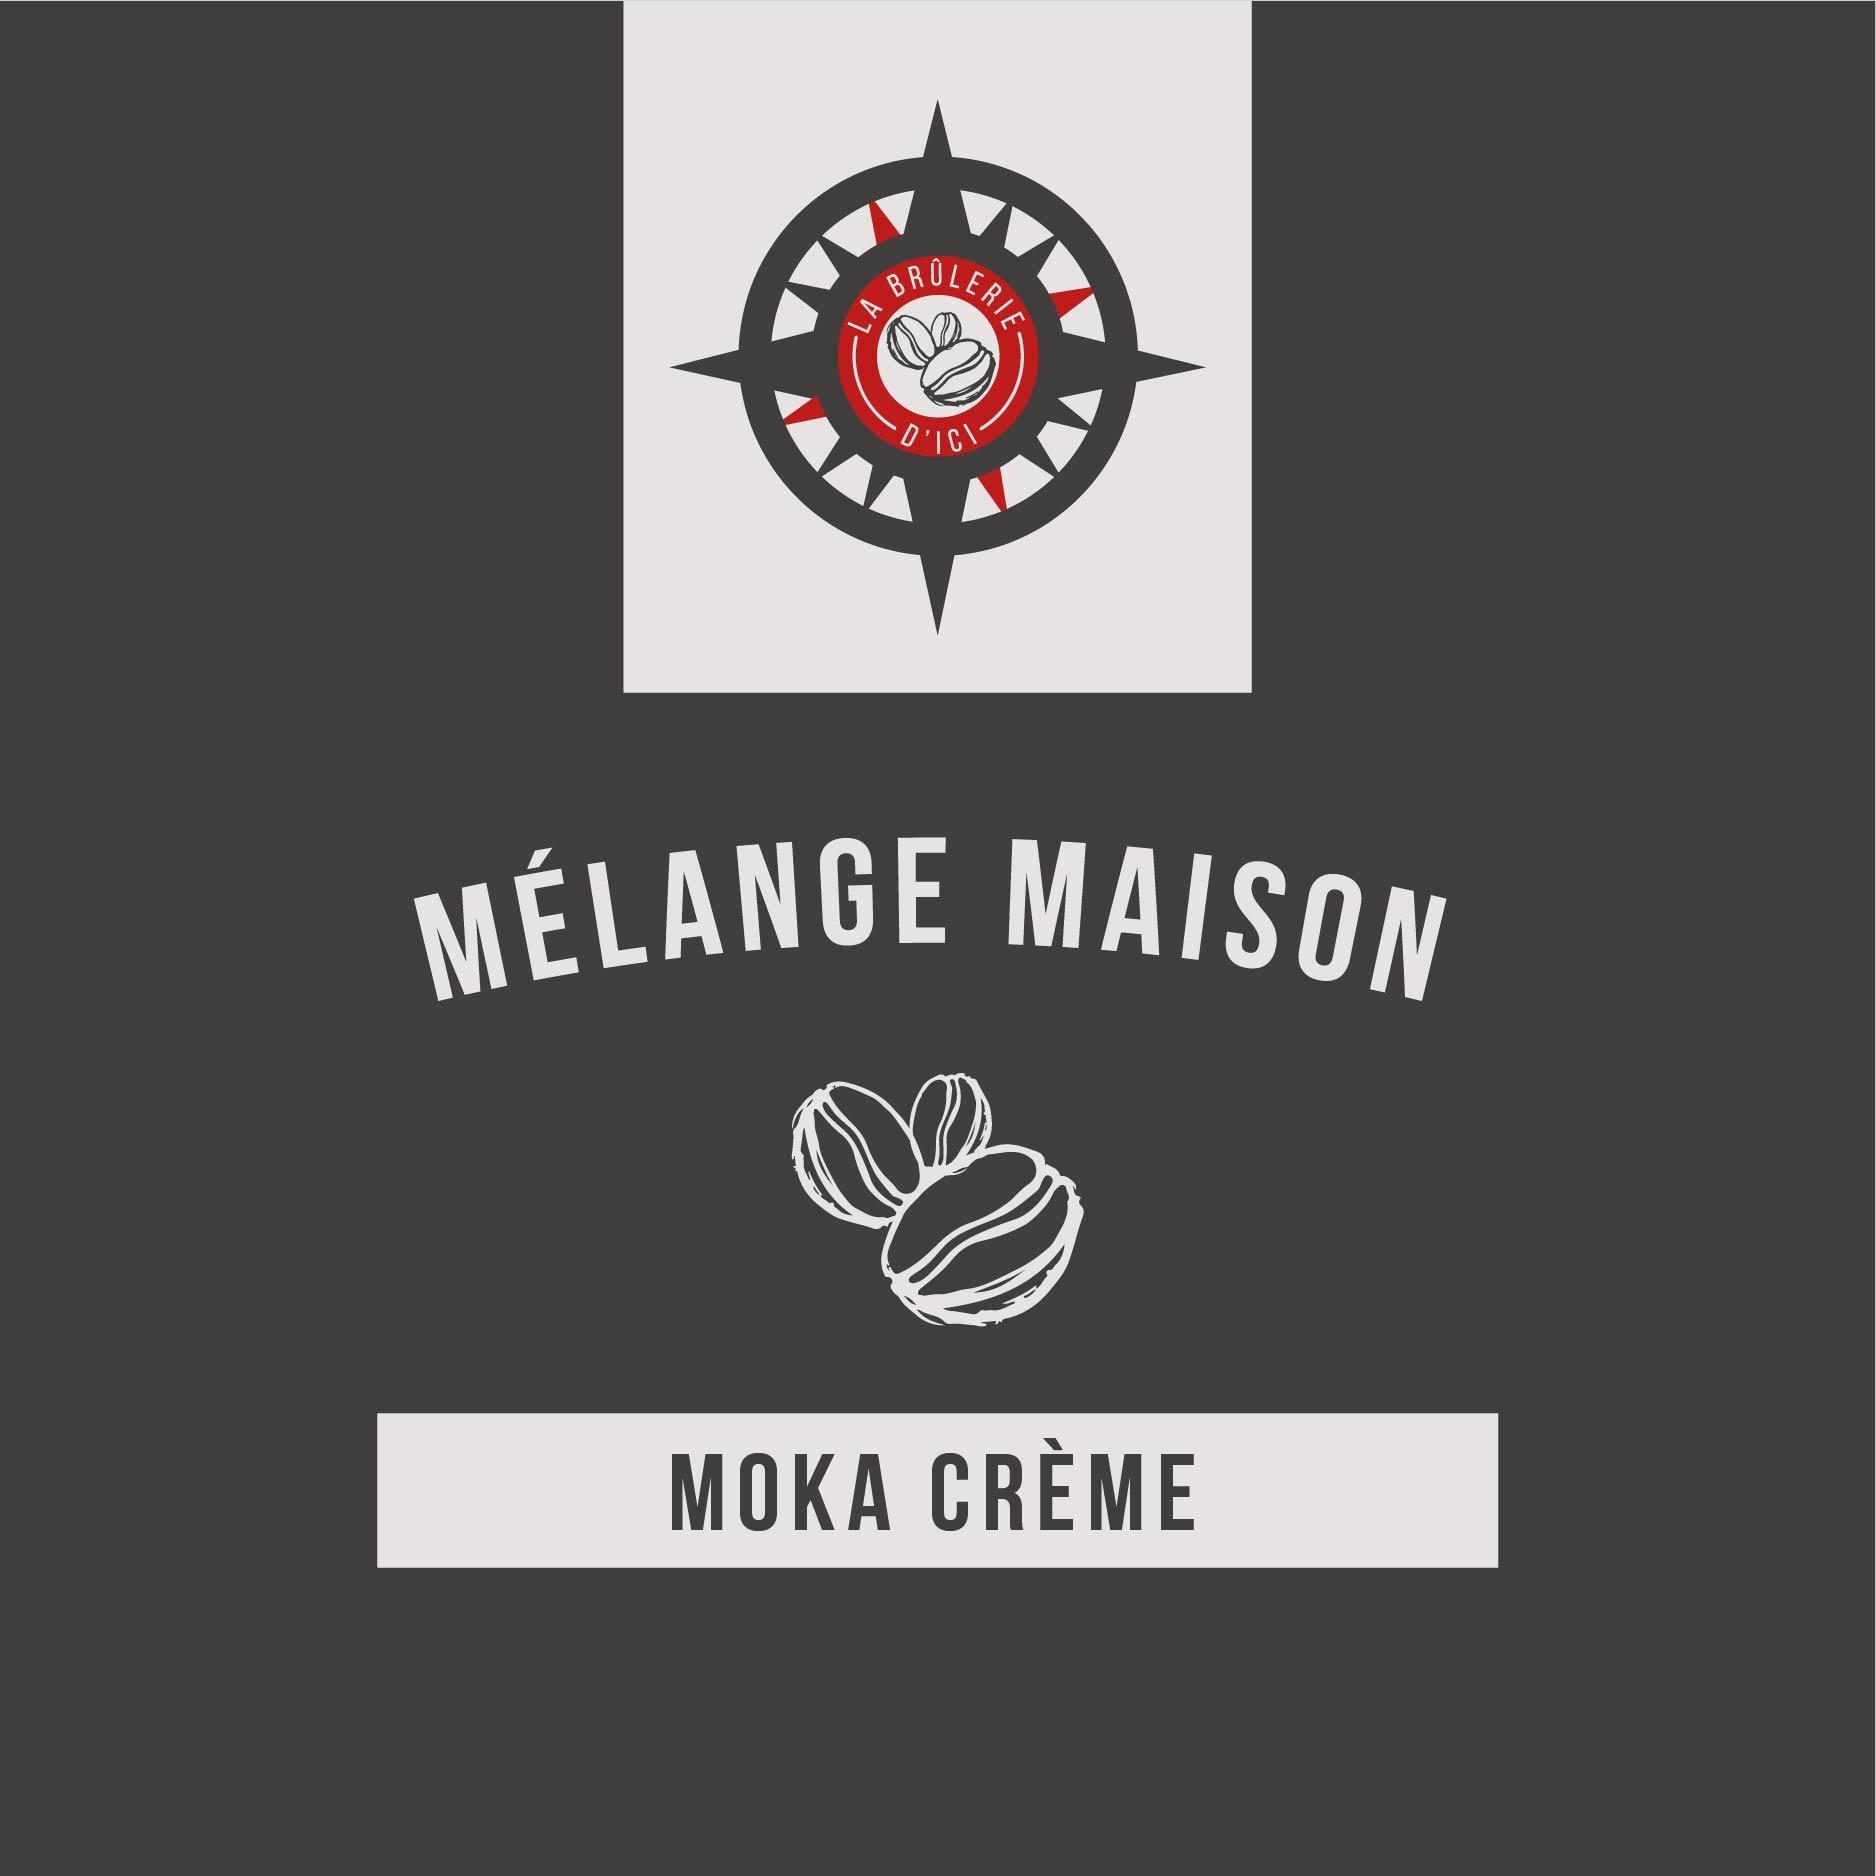 Moka Crème - Mélange maison